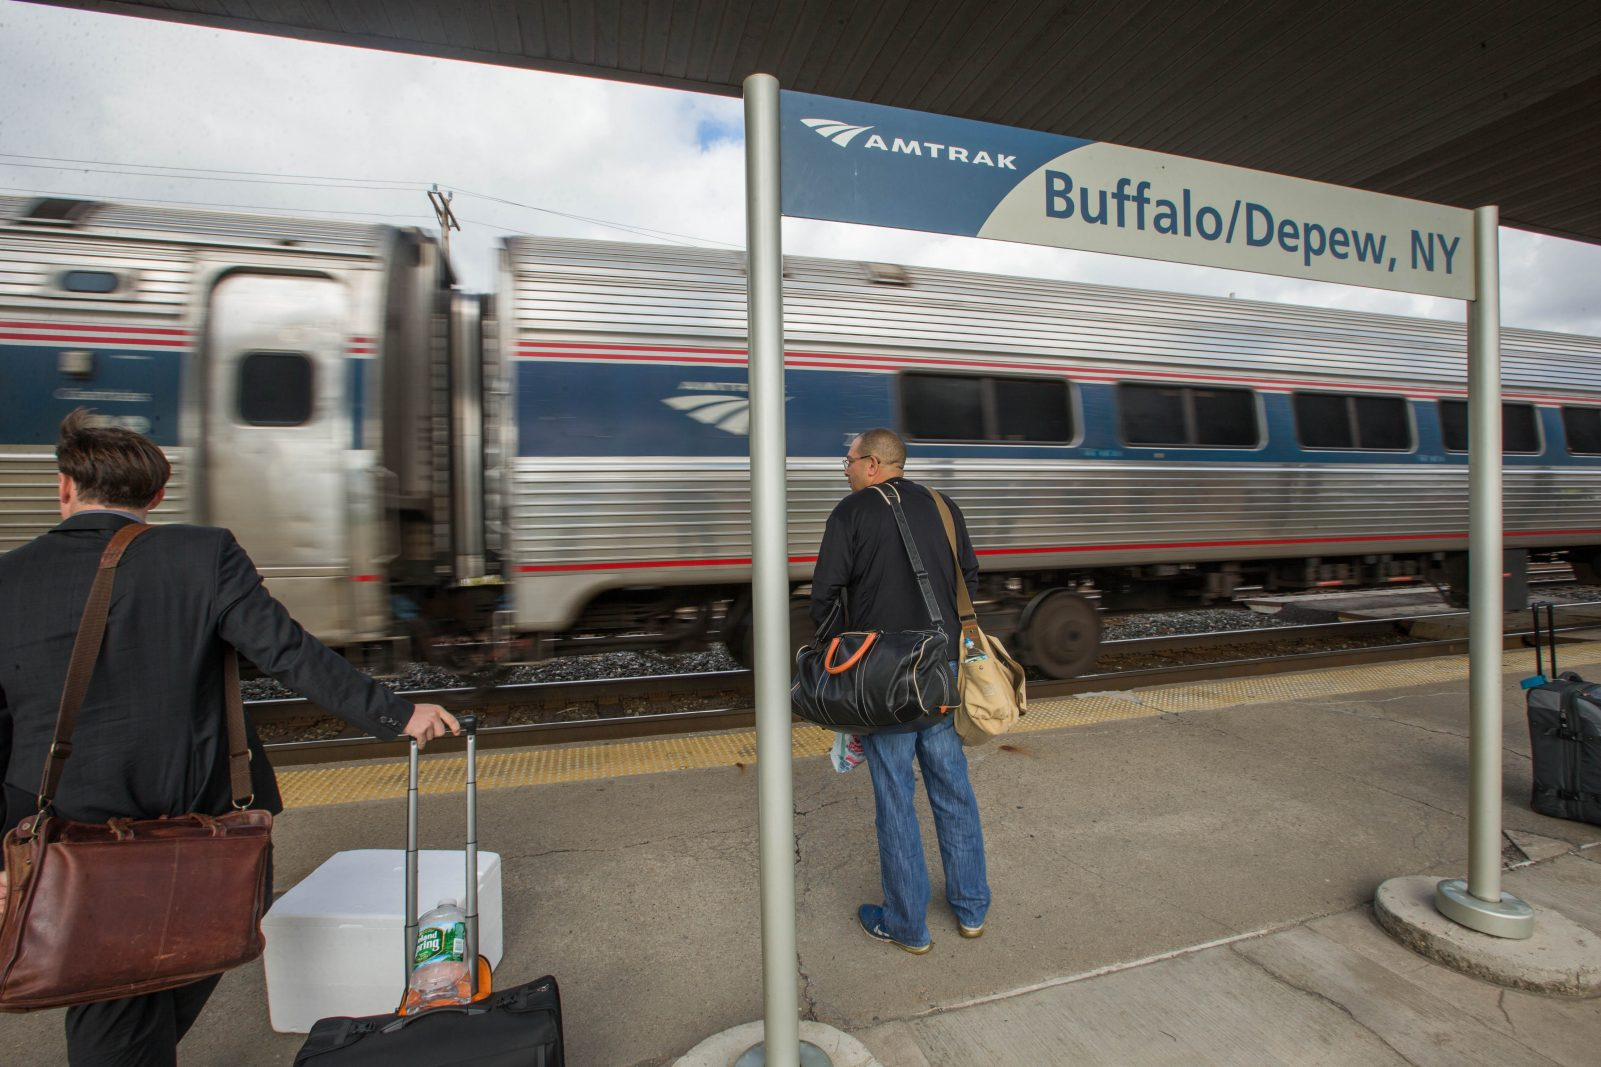 The Amtrak Station in Depew. (Derek Gee/Buffalo News)